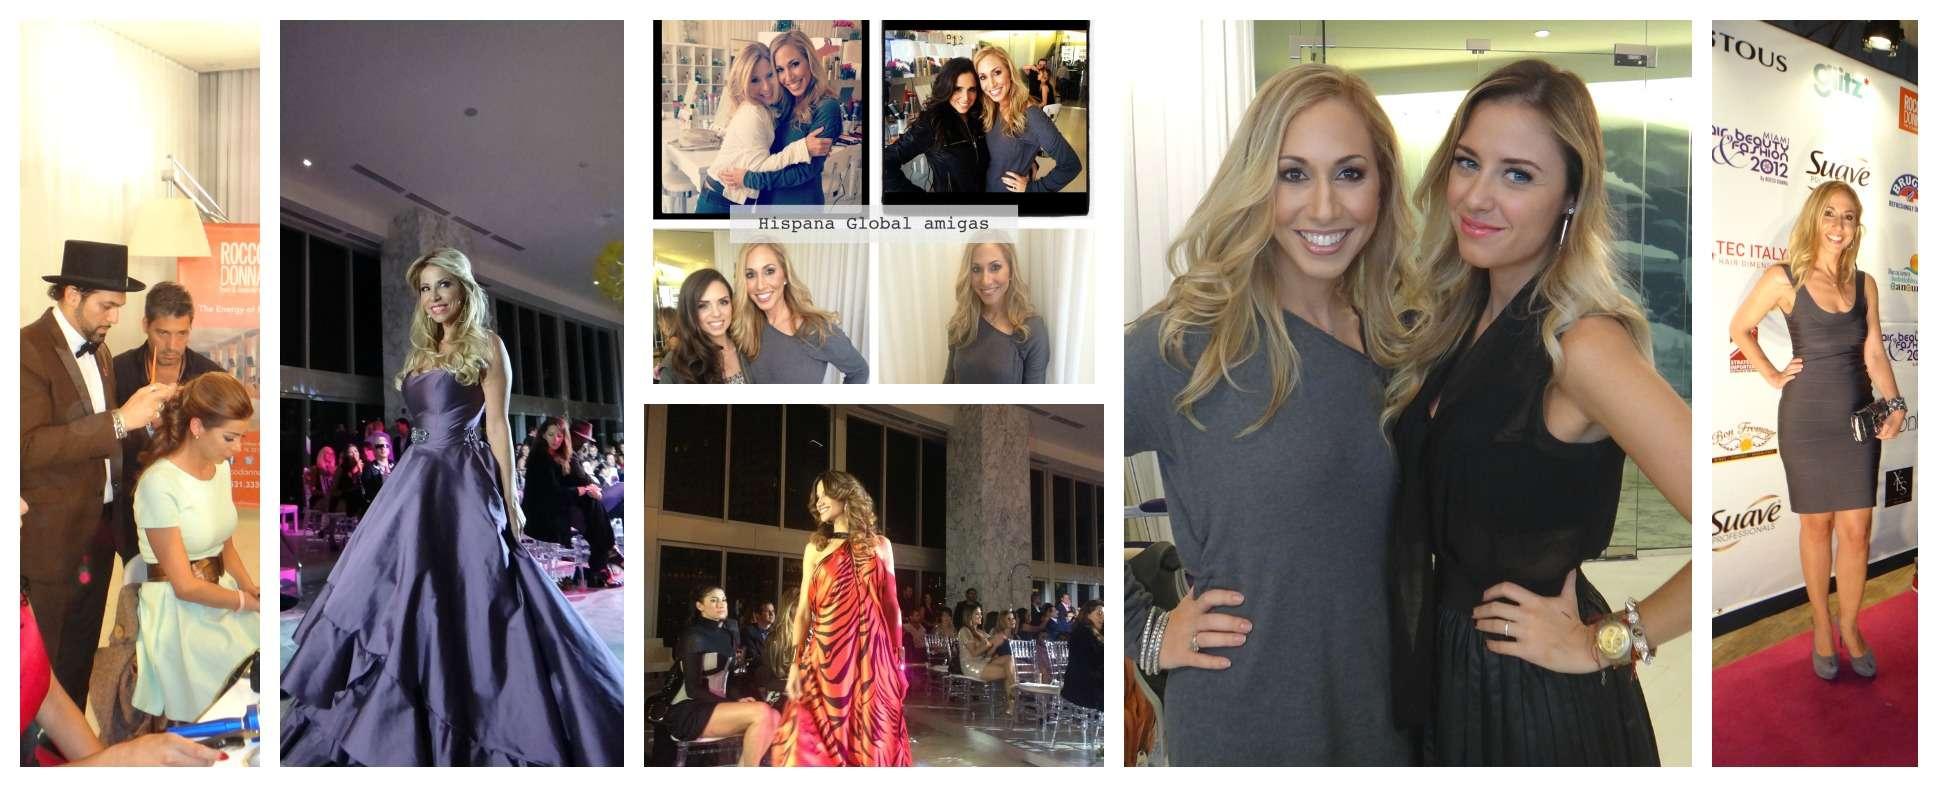 Miami Hair Beauty Fashion 2012 By Rocco Donna Fashion Show